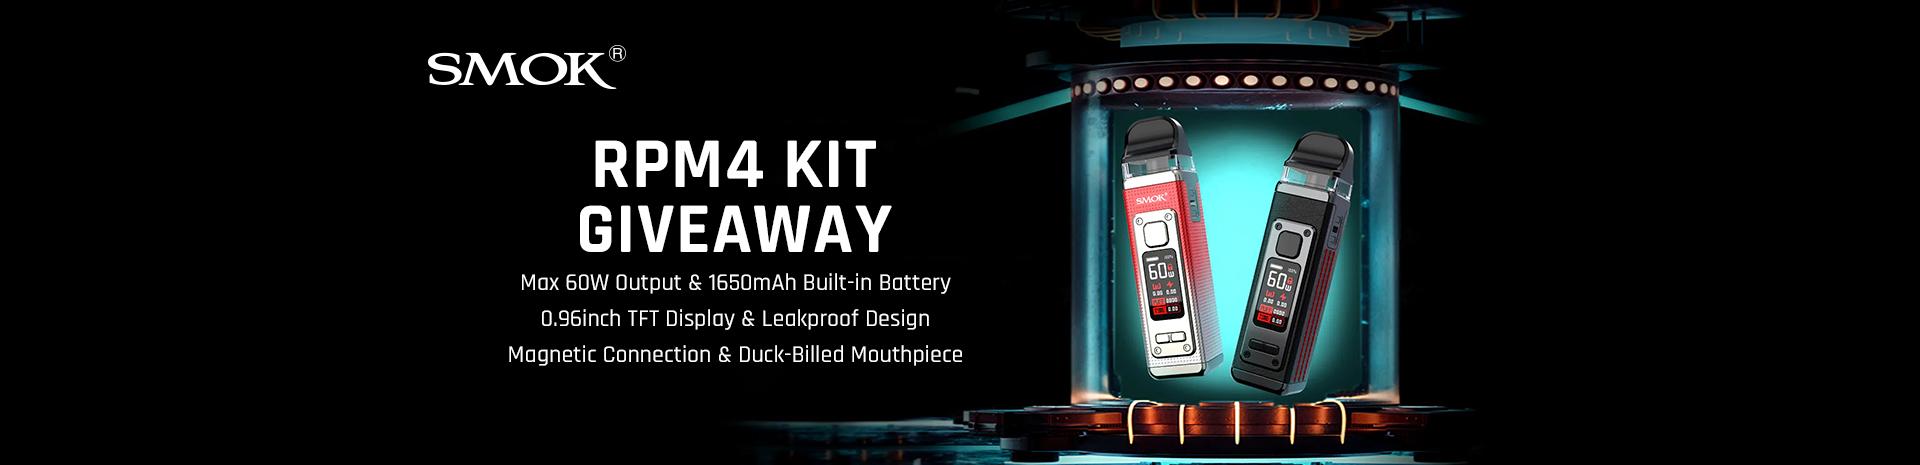 SMOK RPM 4 Kit Giveaway Banner